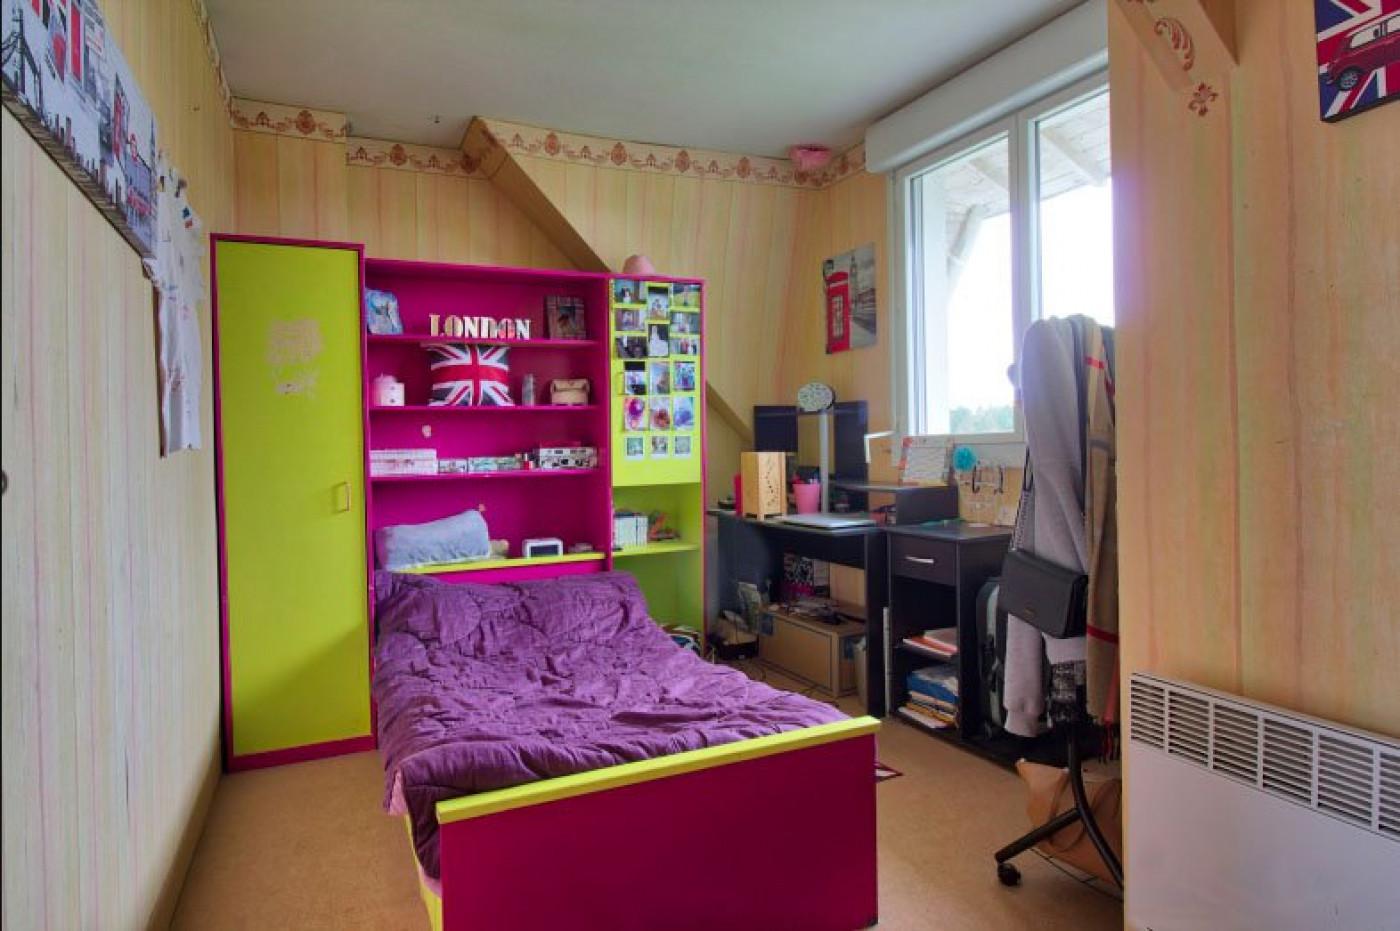 A vendre  Isse   Réf 44015732 - Agence porte neuve immobilier